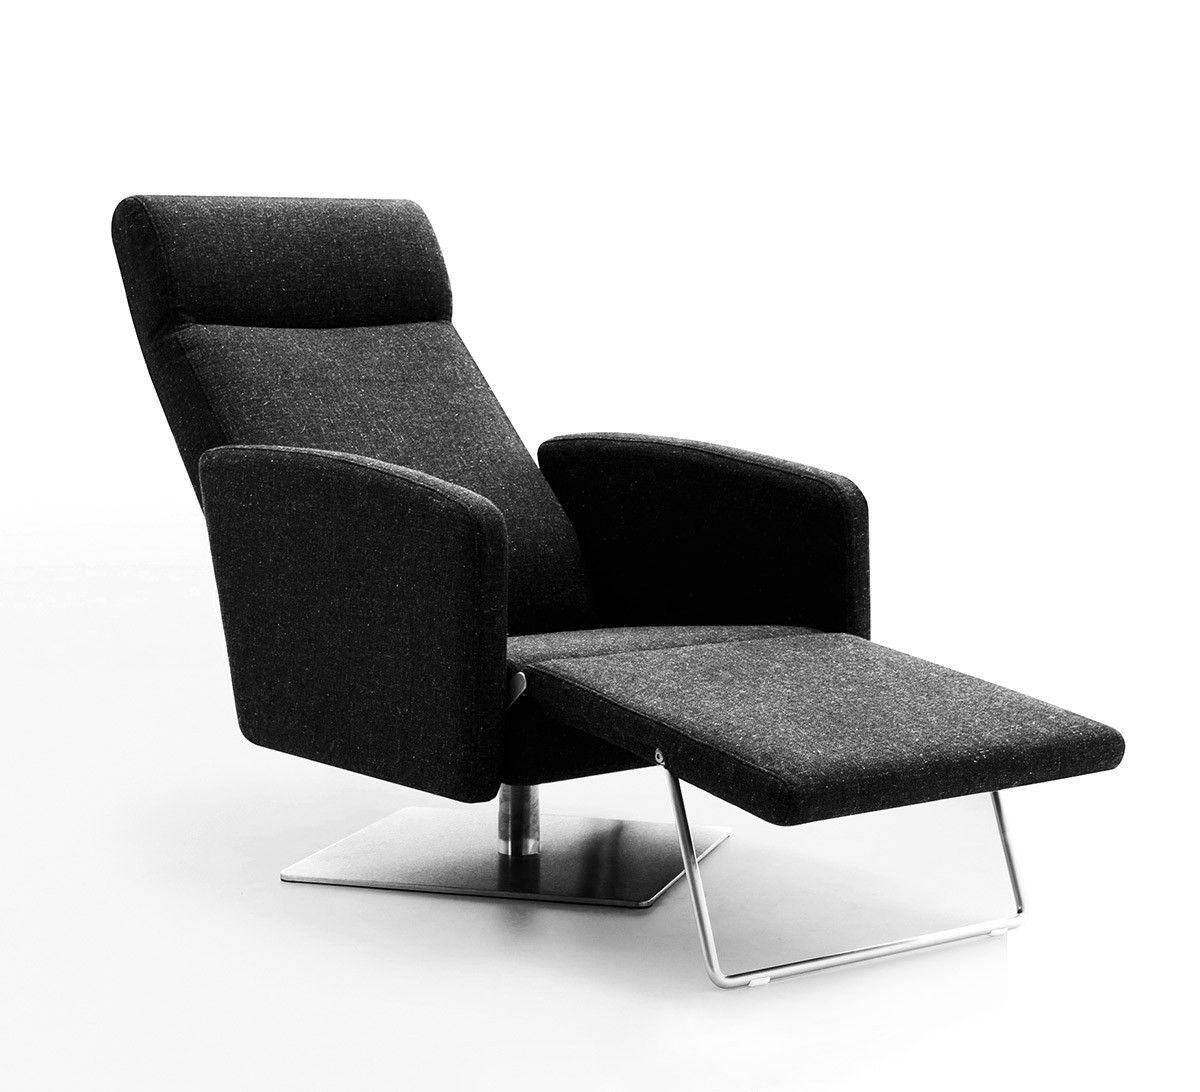 Abbot Modern Fabric Reclining Lounge Chair Modern Recliner Leather Chaise Lounge Chair Recliner